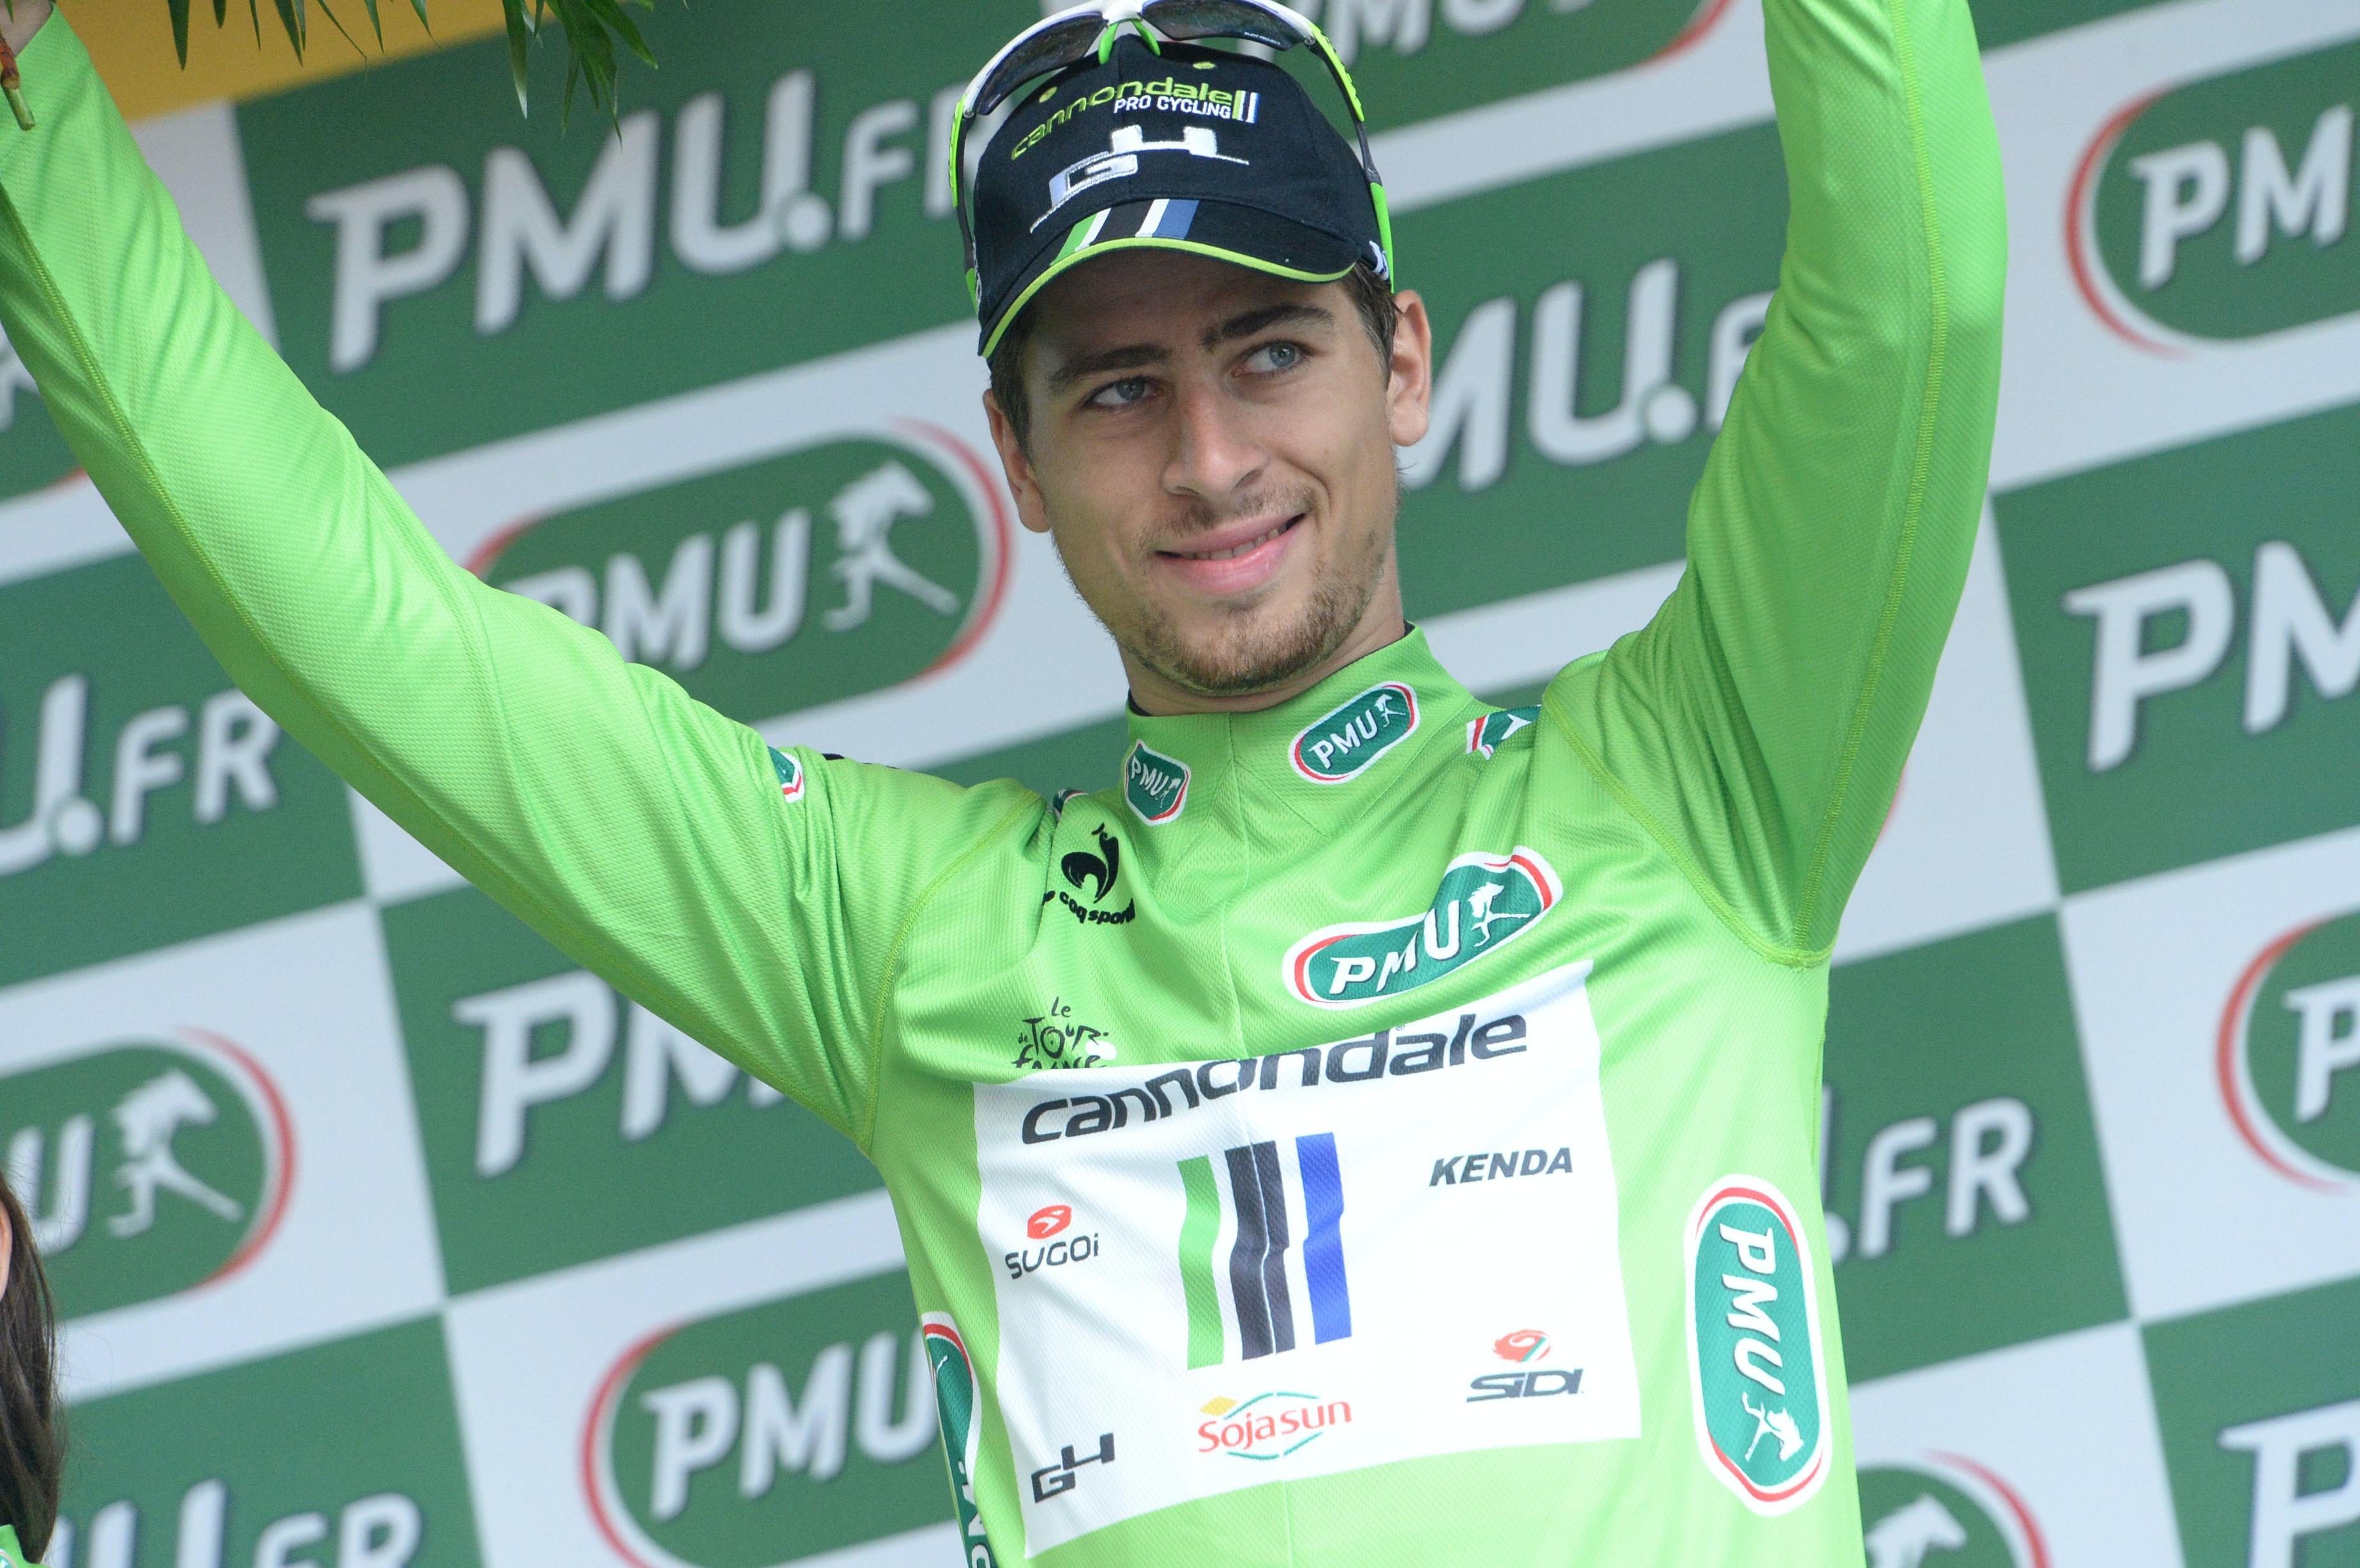 Peter Sagan, Cannondale, Tour de France, 2014, stage 15, pic: Sirotti